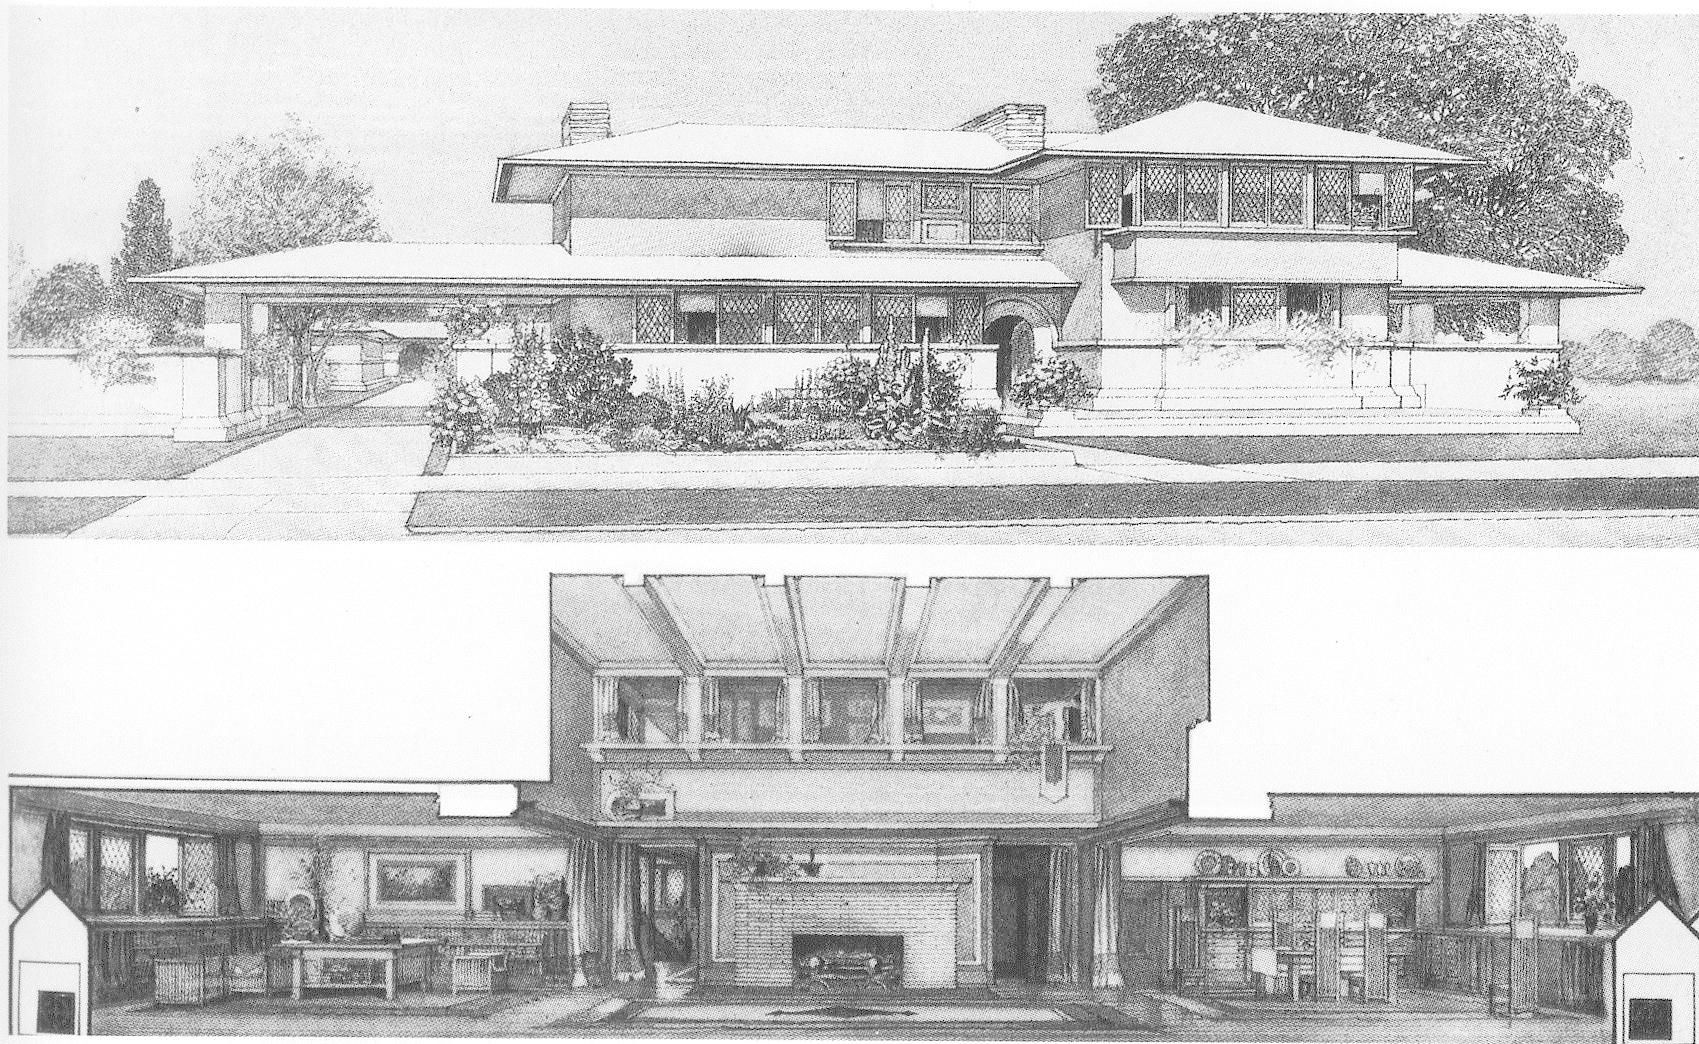 Frank Lloyd Wright Falling Water Wallpaper Quot Frank Lloyd Wright Quot Amp Illustrations Google Search